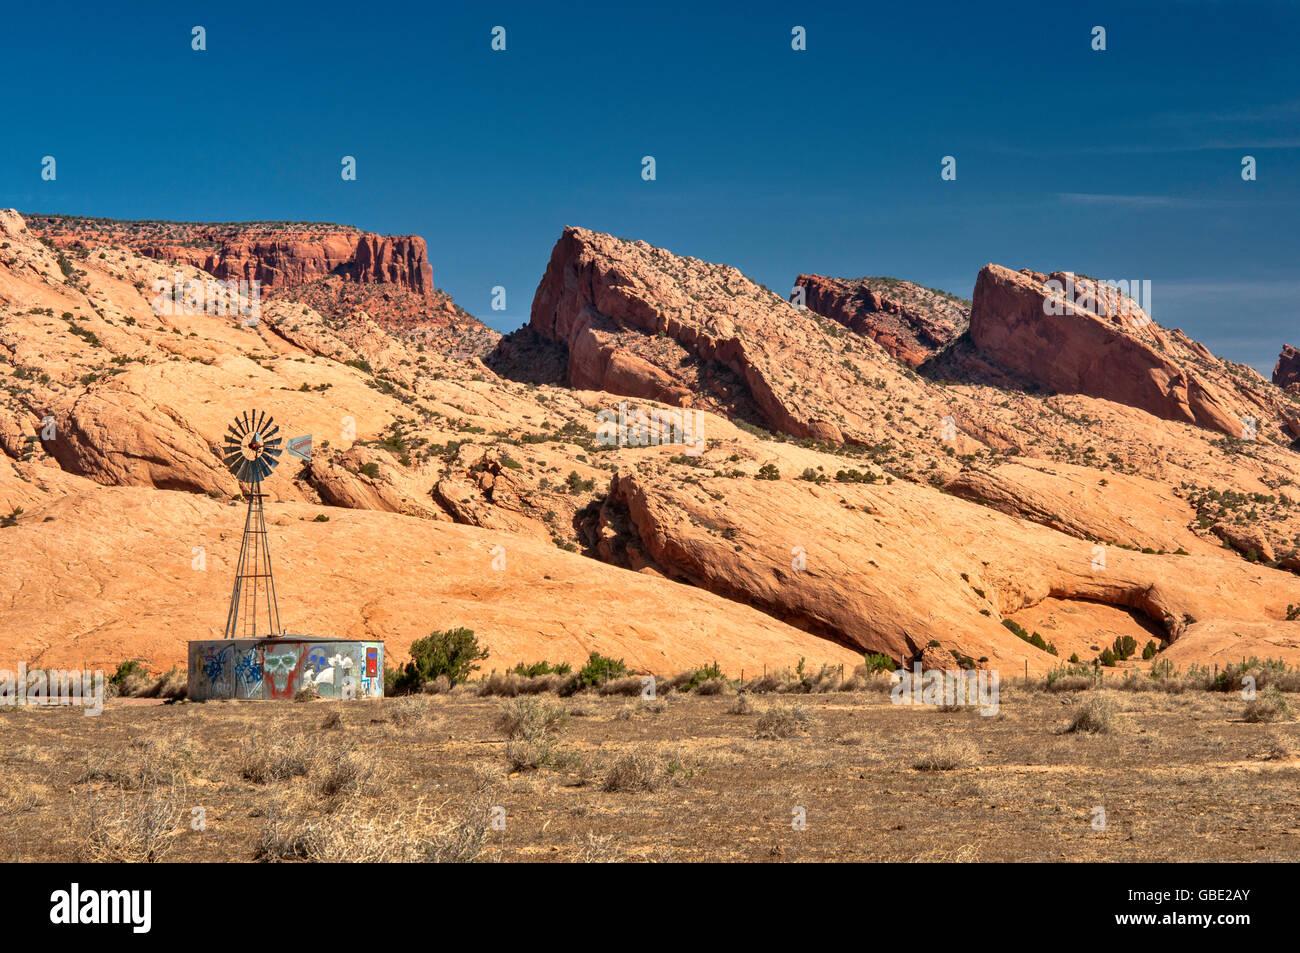 Windmill and water tank, Skeleton Mesa sandstone slickrock behind, Navajo Indian Reservation, near Kayenta, Arizona, - Stock Image